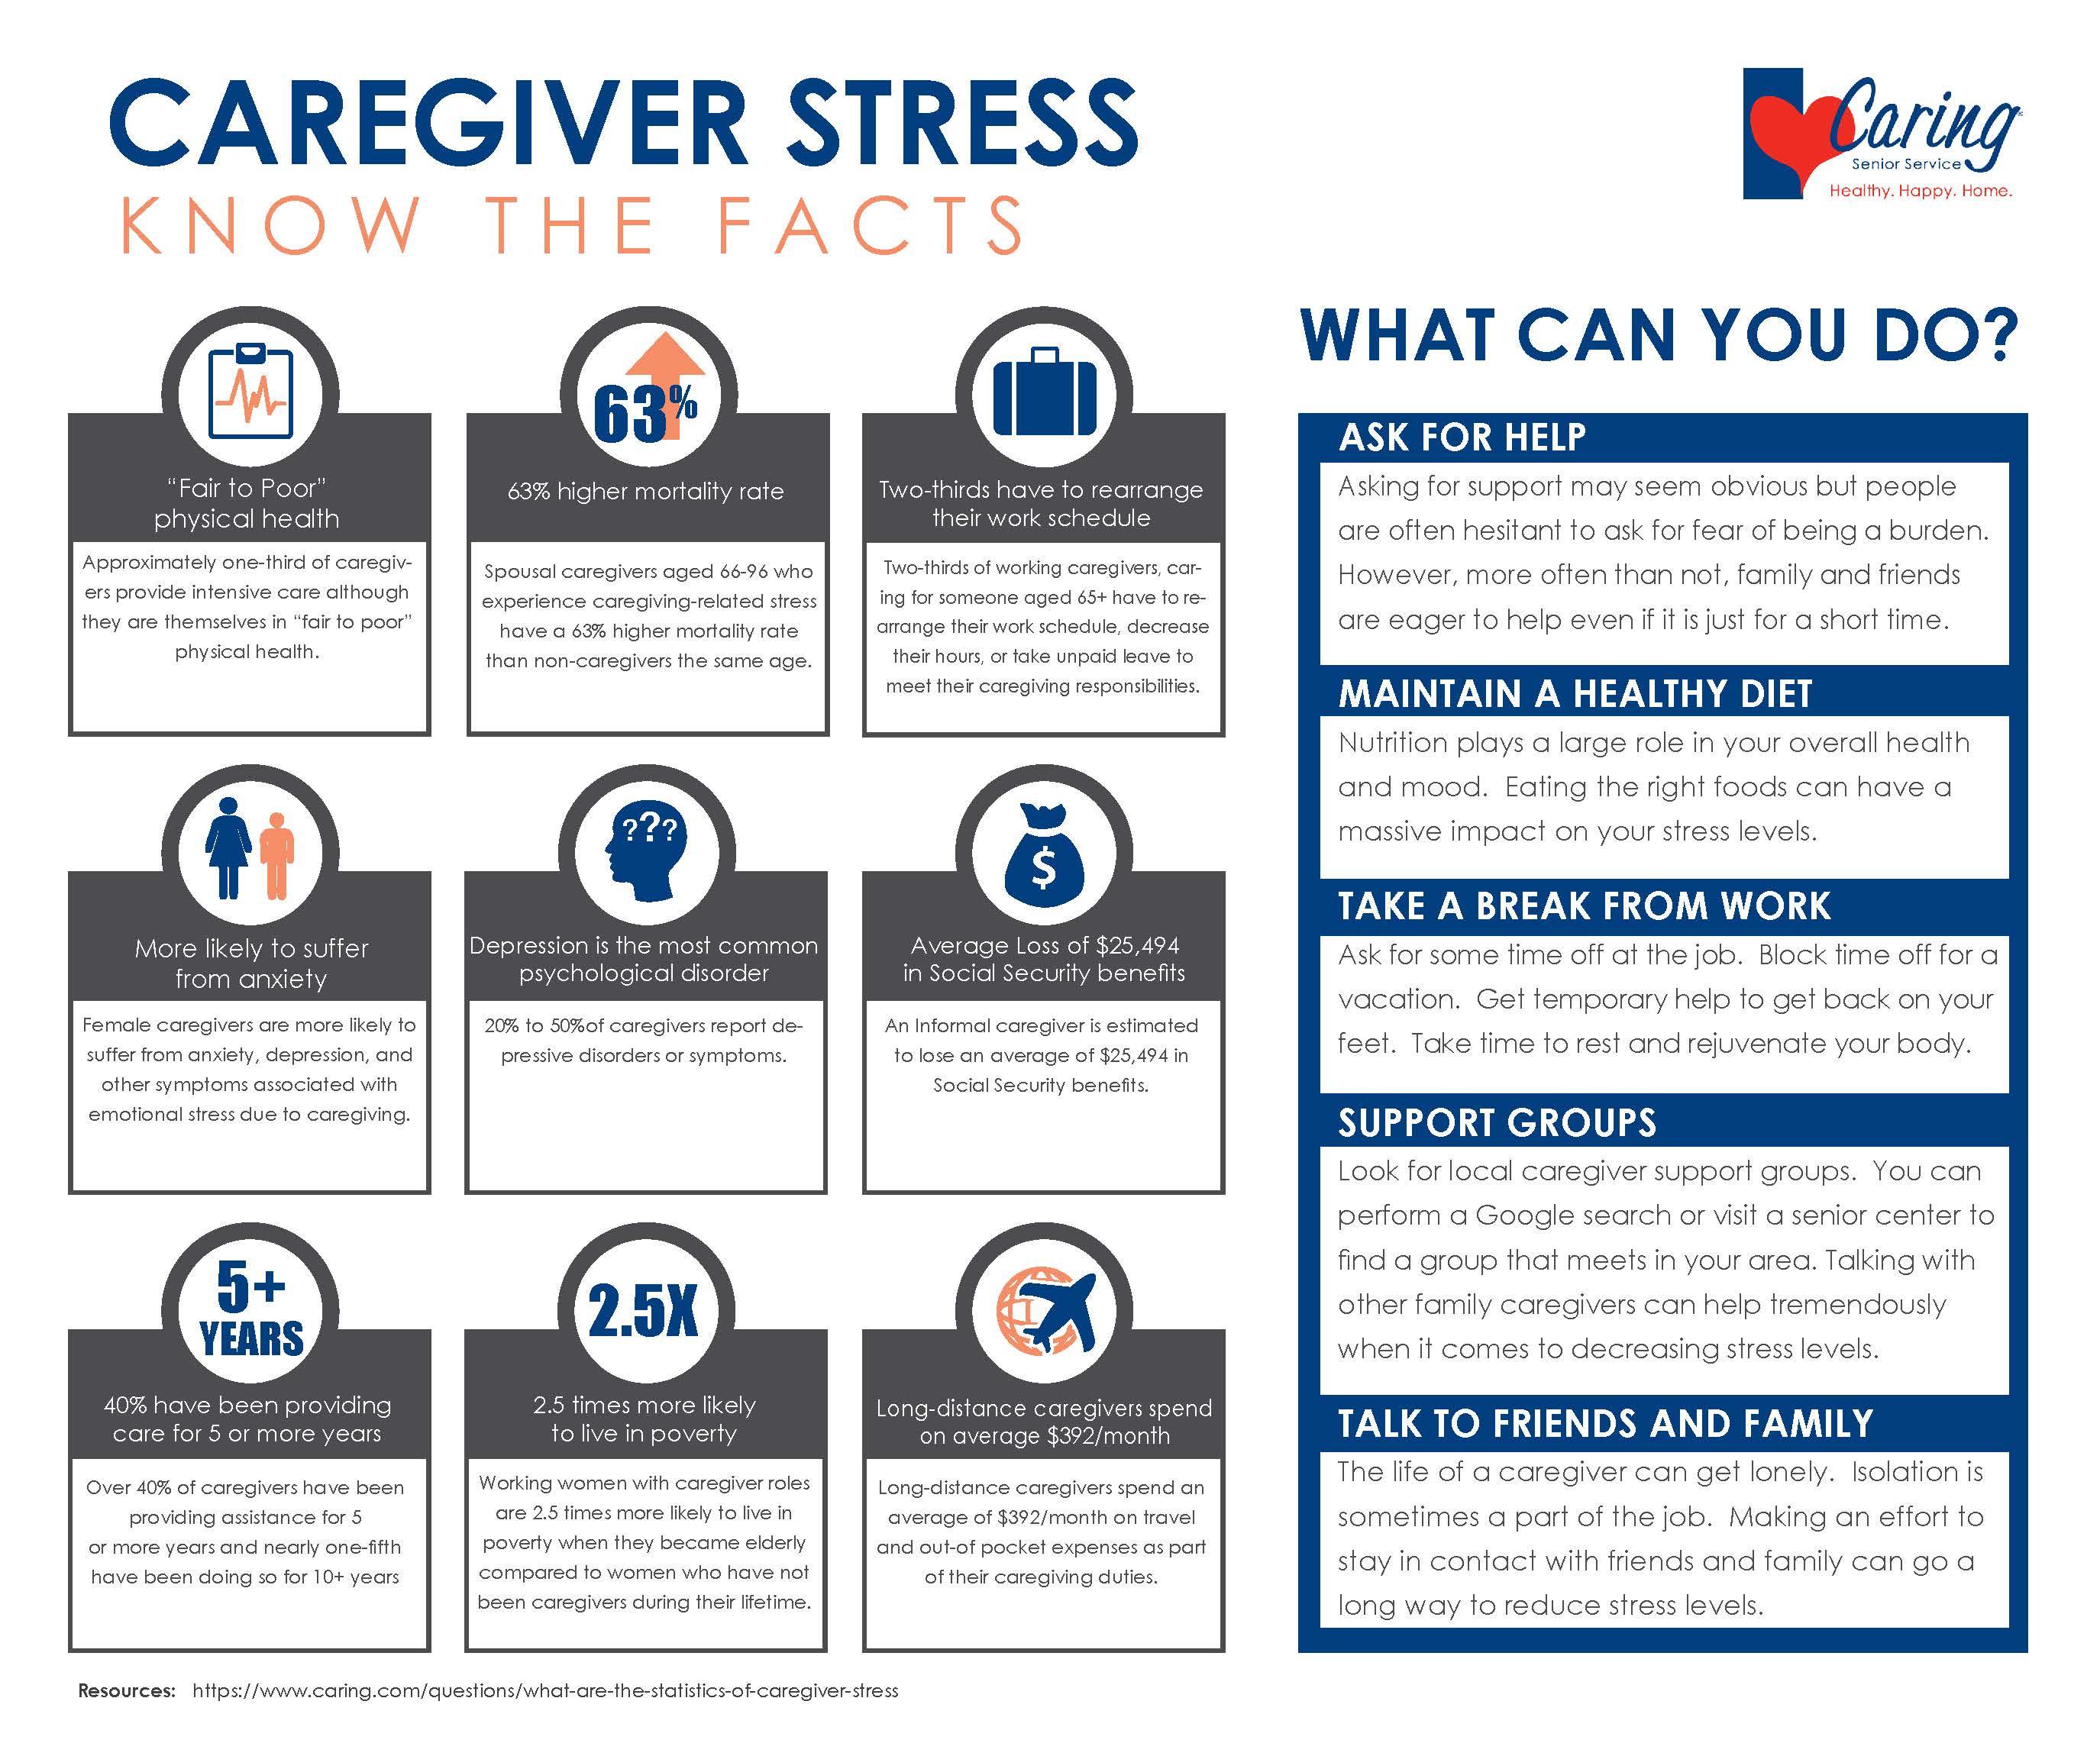 Caregiver Stress Fact Sheet